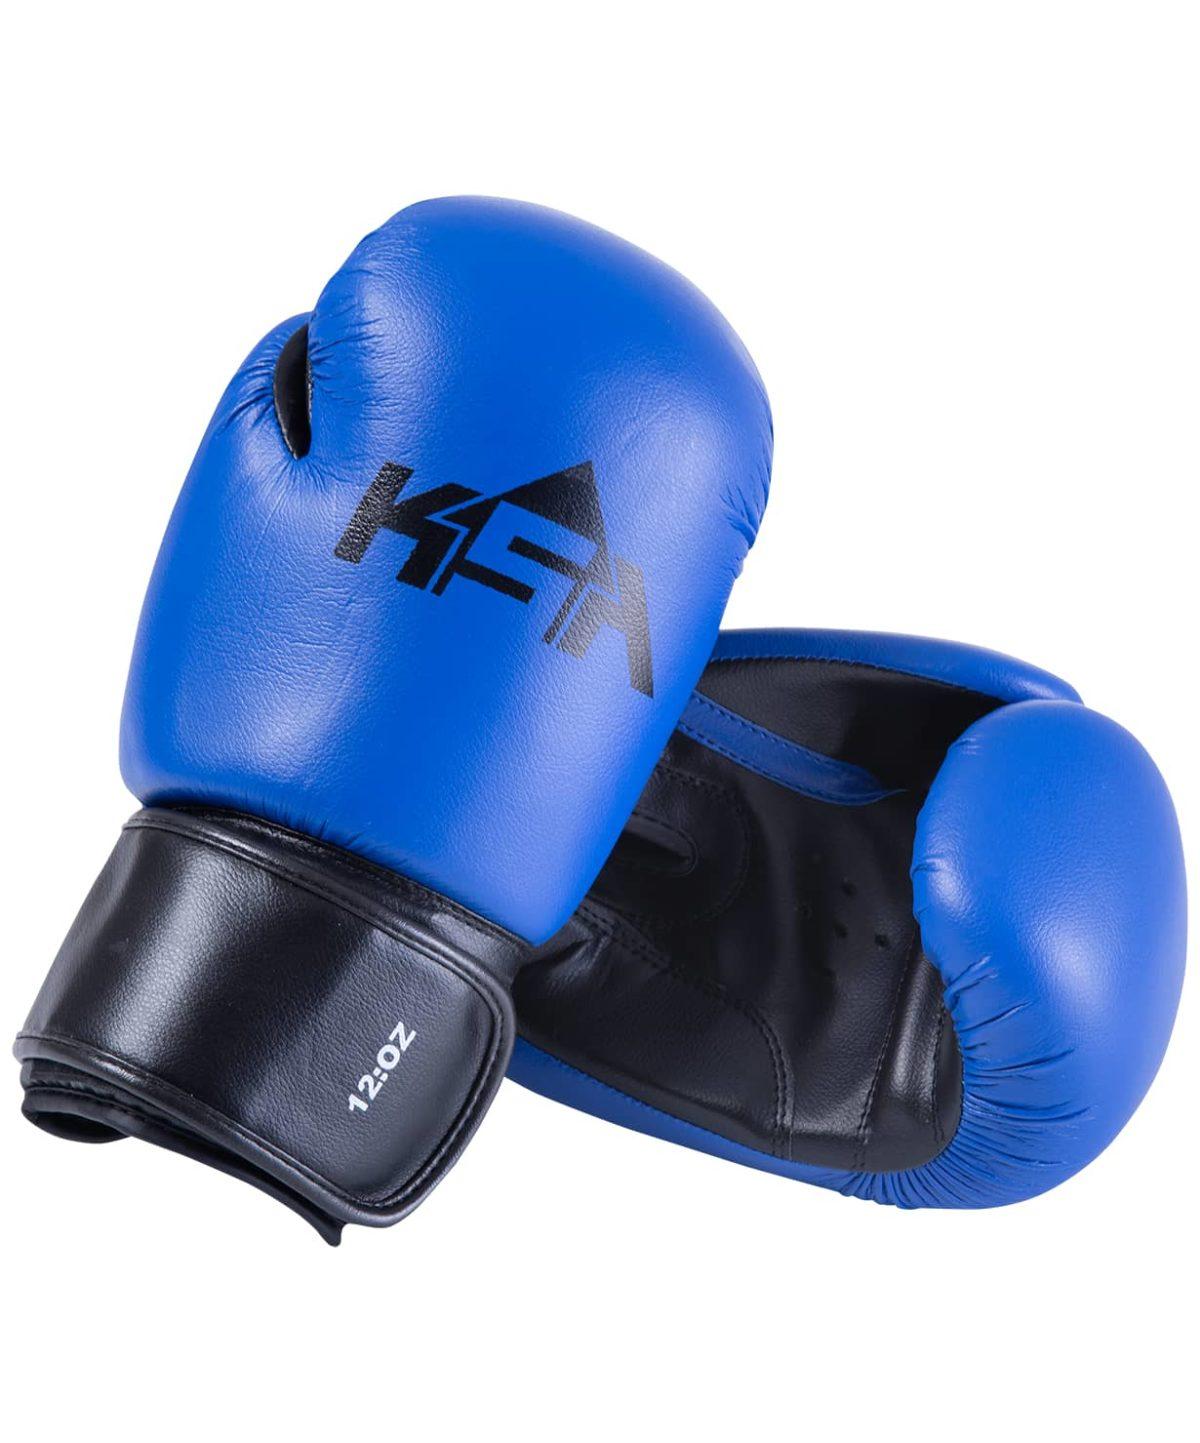 KSA Spider Blue Перчатки боксерские, 8 oz, к/з 17805 - 1